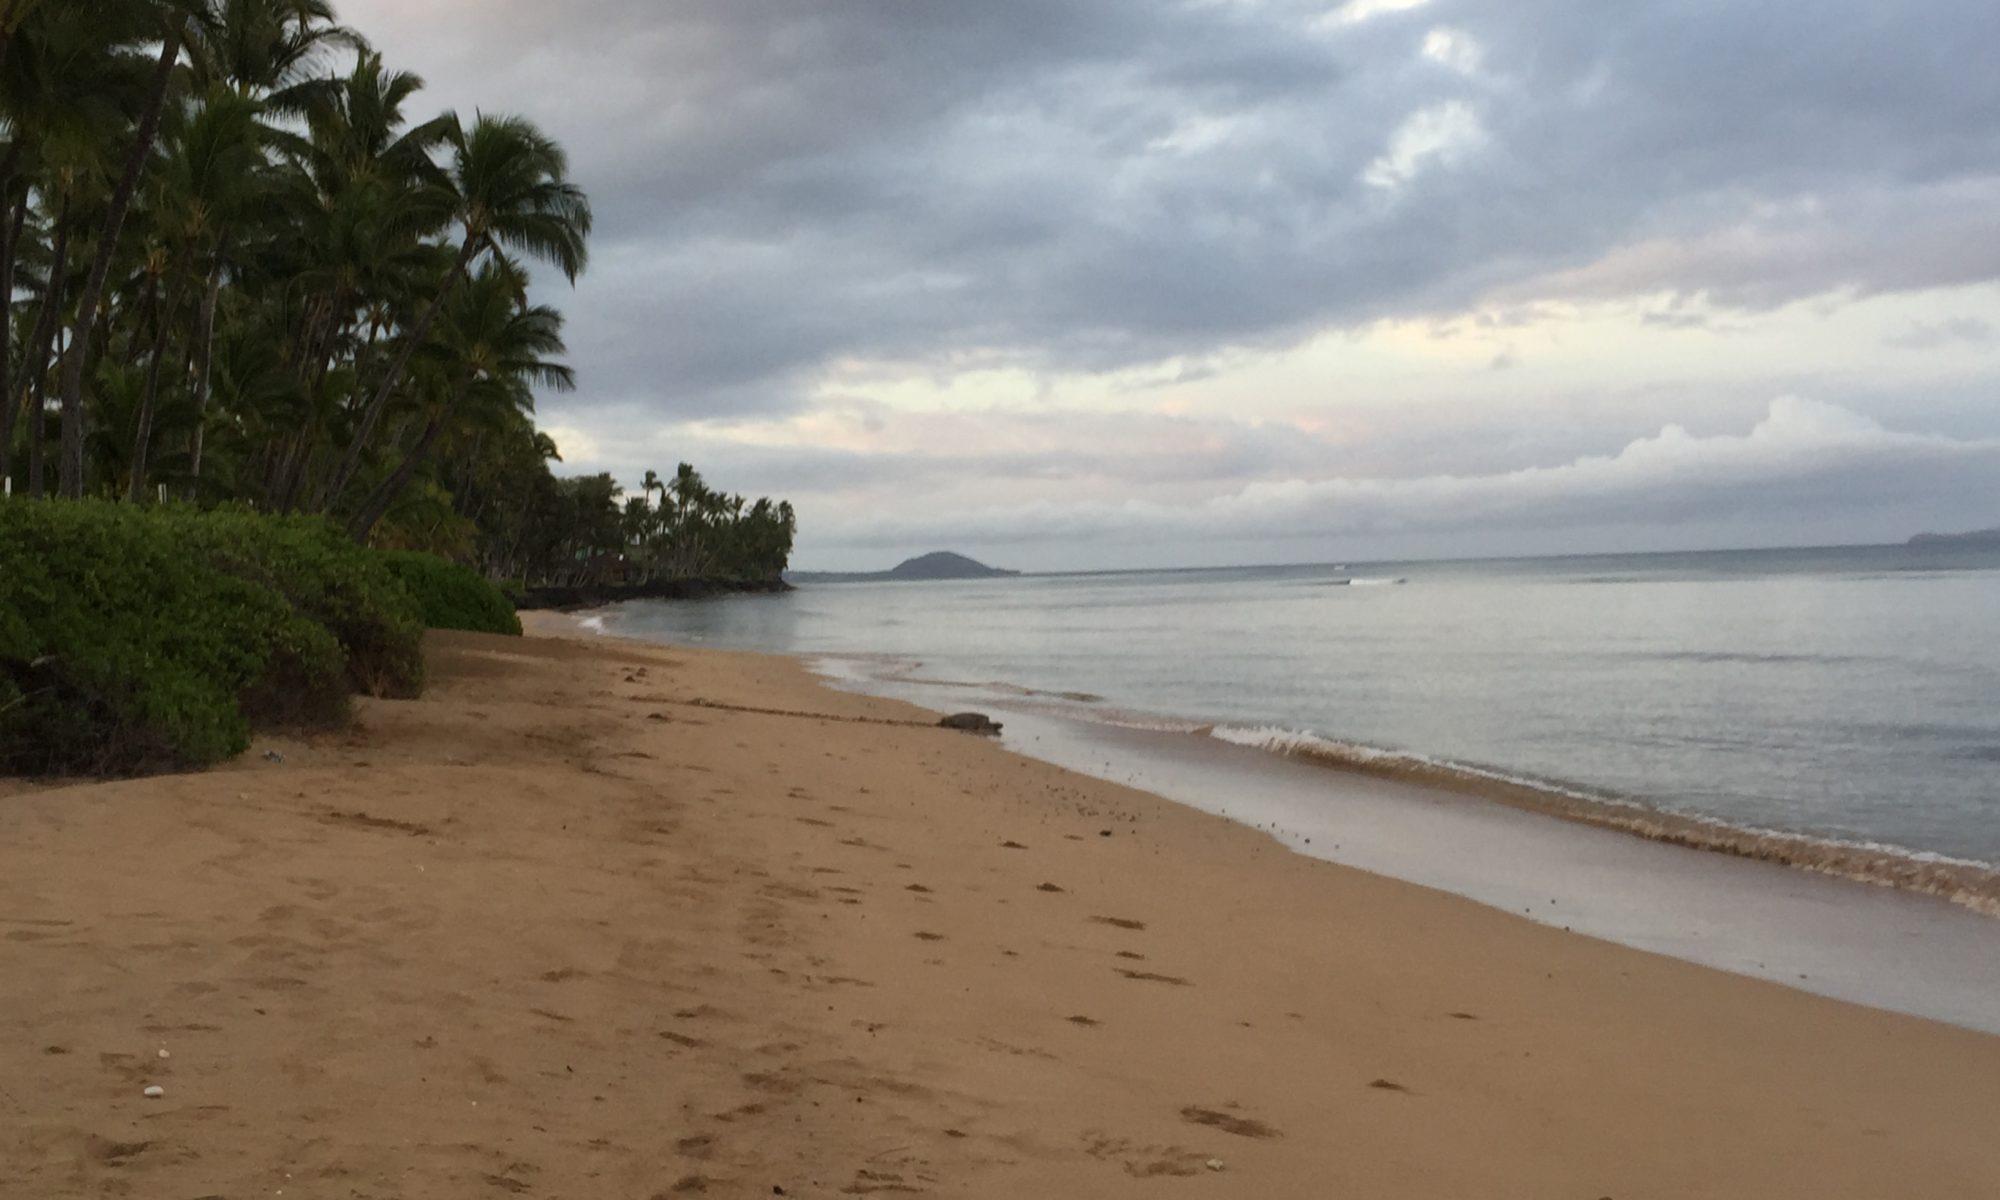 Kihei Beach with Sea Turtle